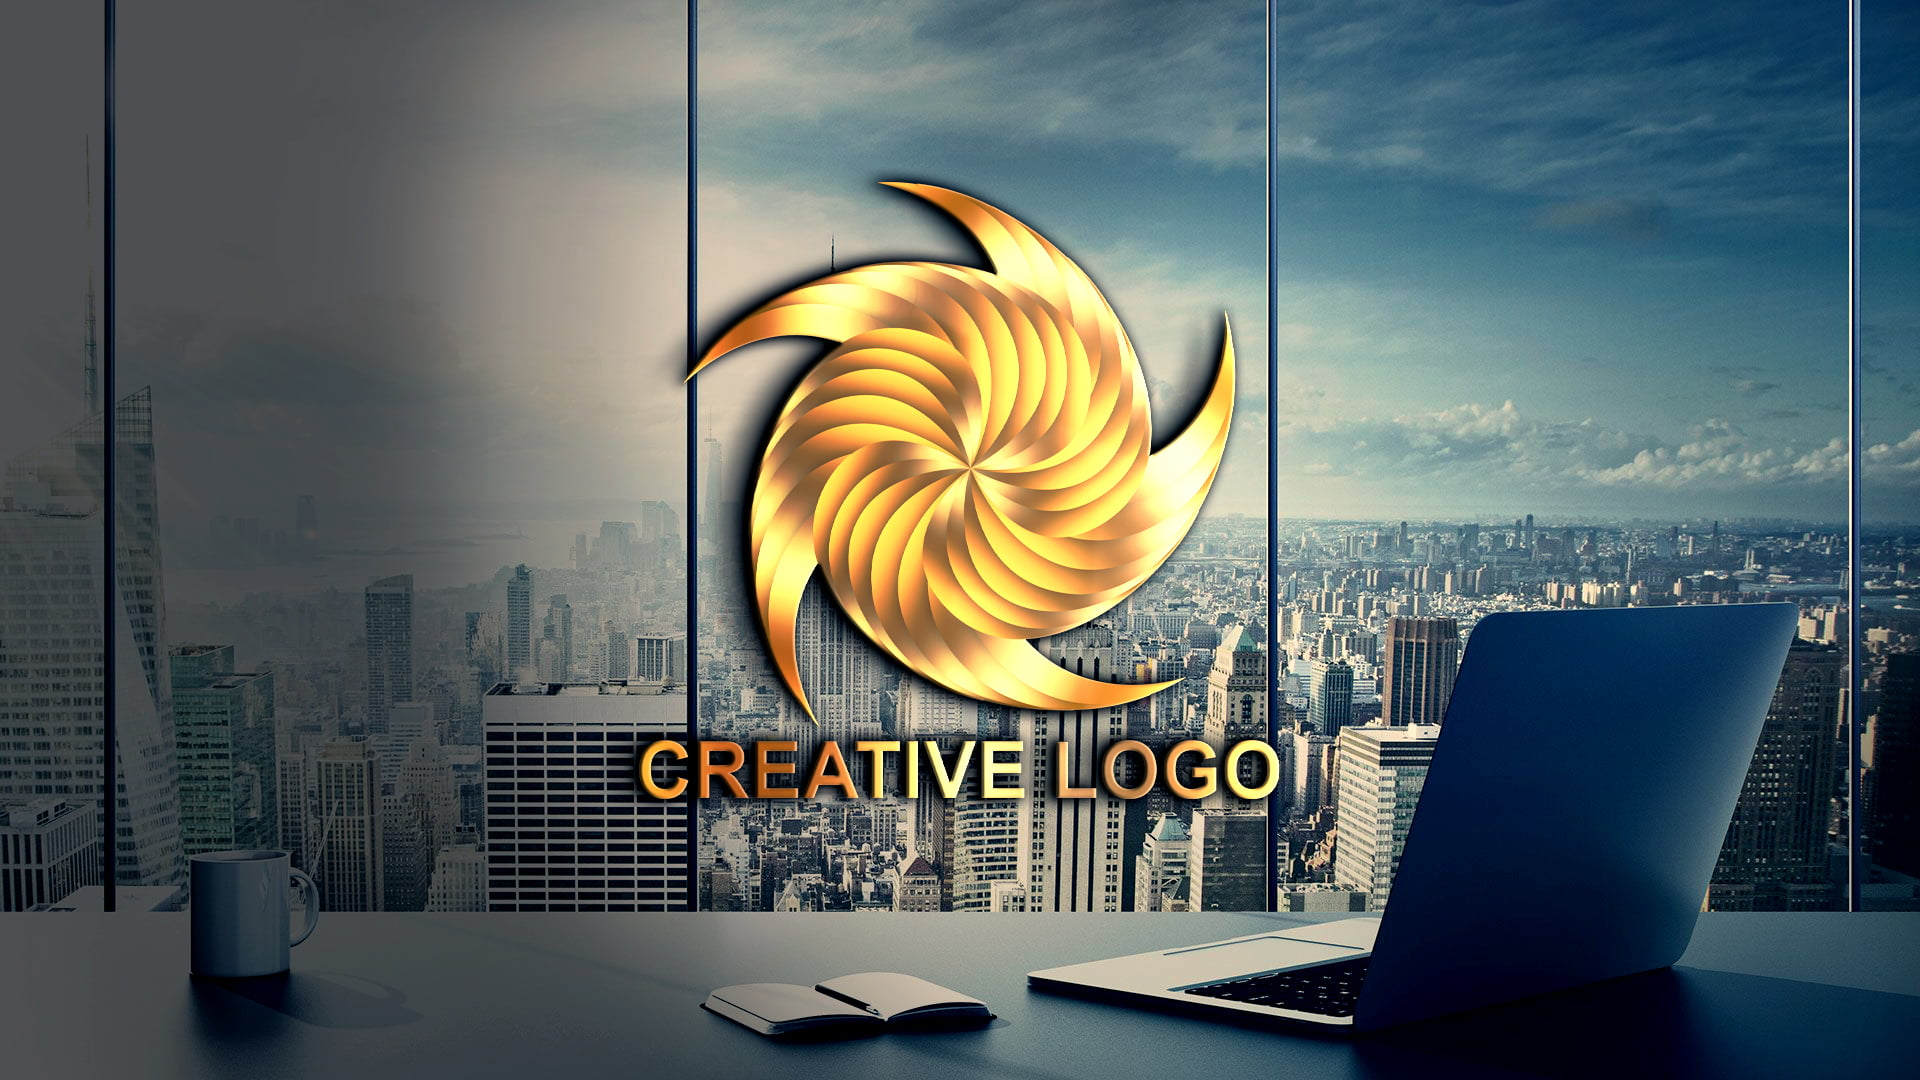 Free Creative Abstract Logo Design PSD source